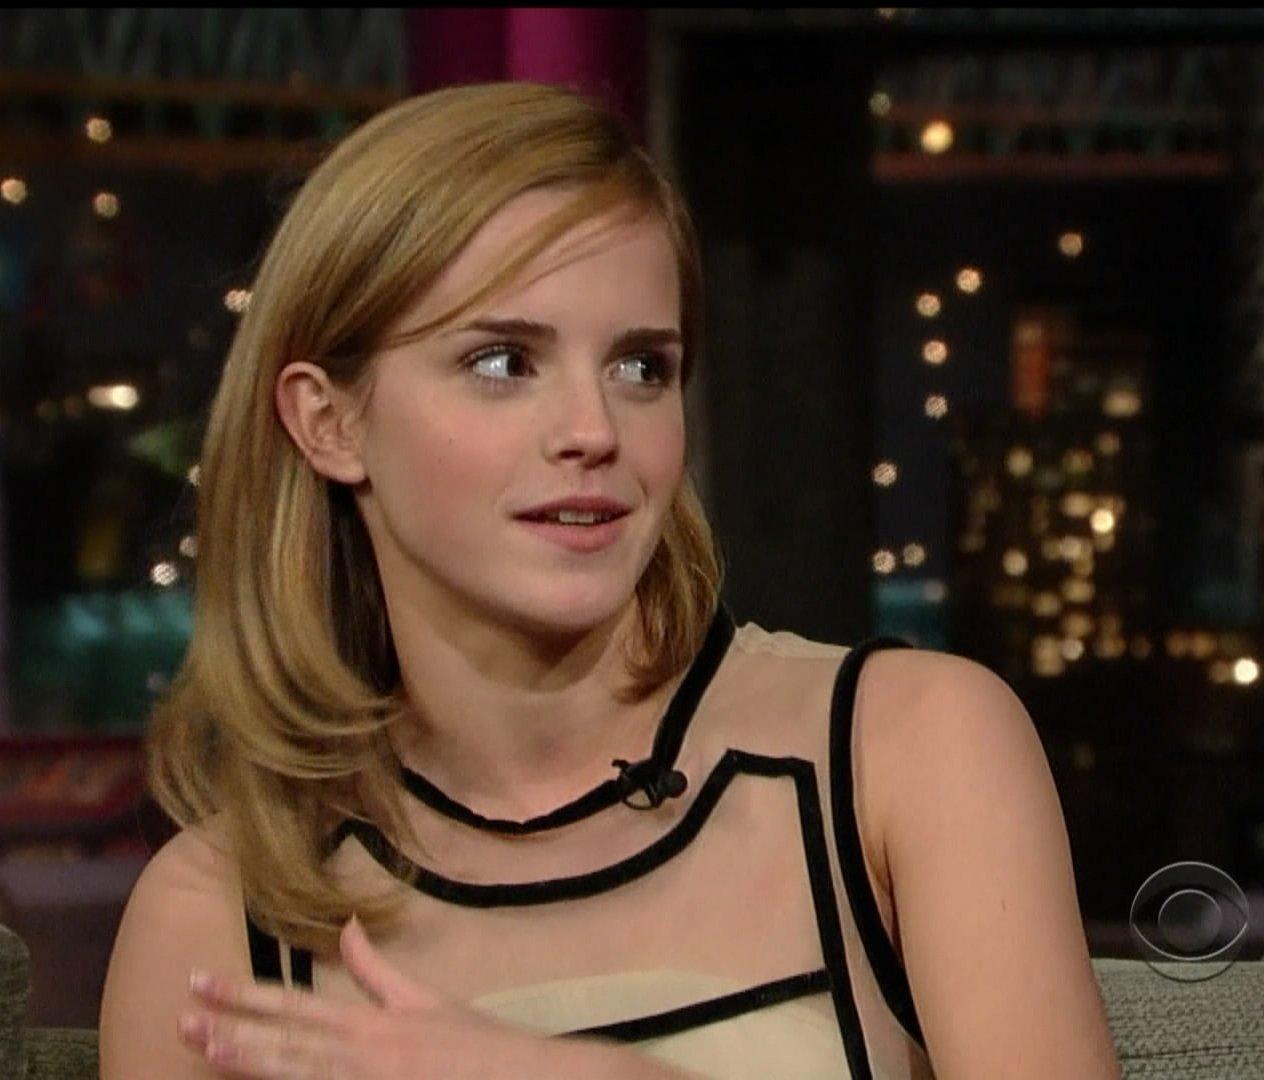 Emma Watson Upskirt On Letterman | Jihad Celebs